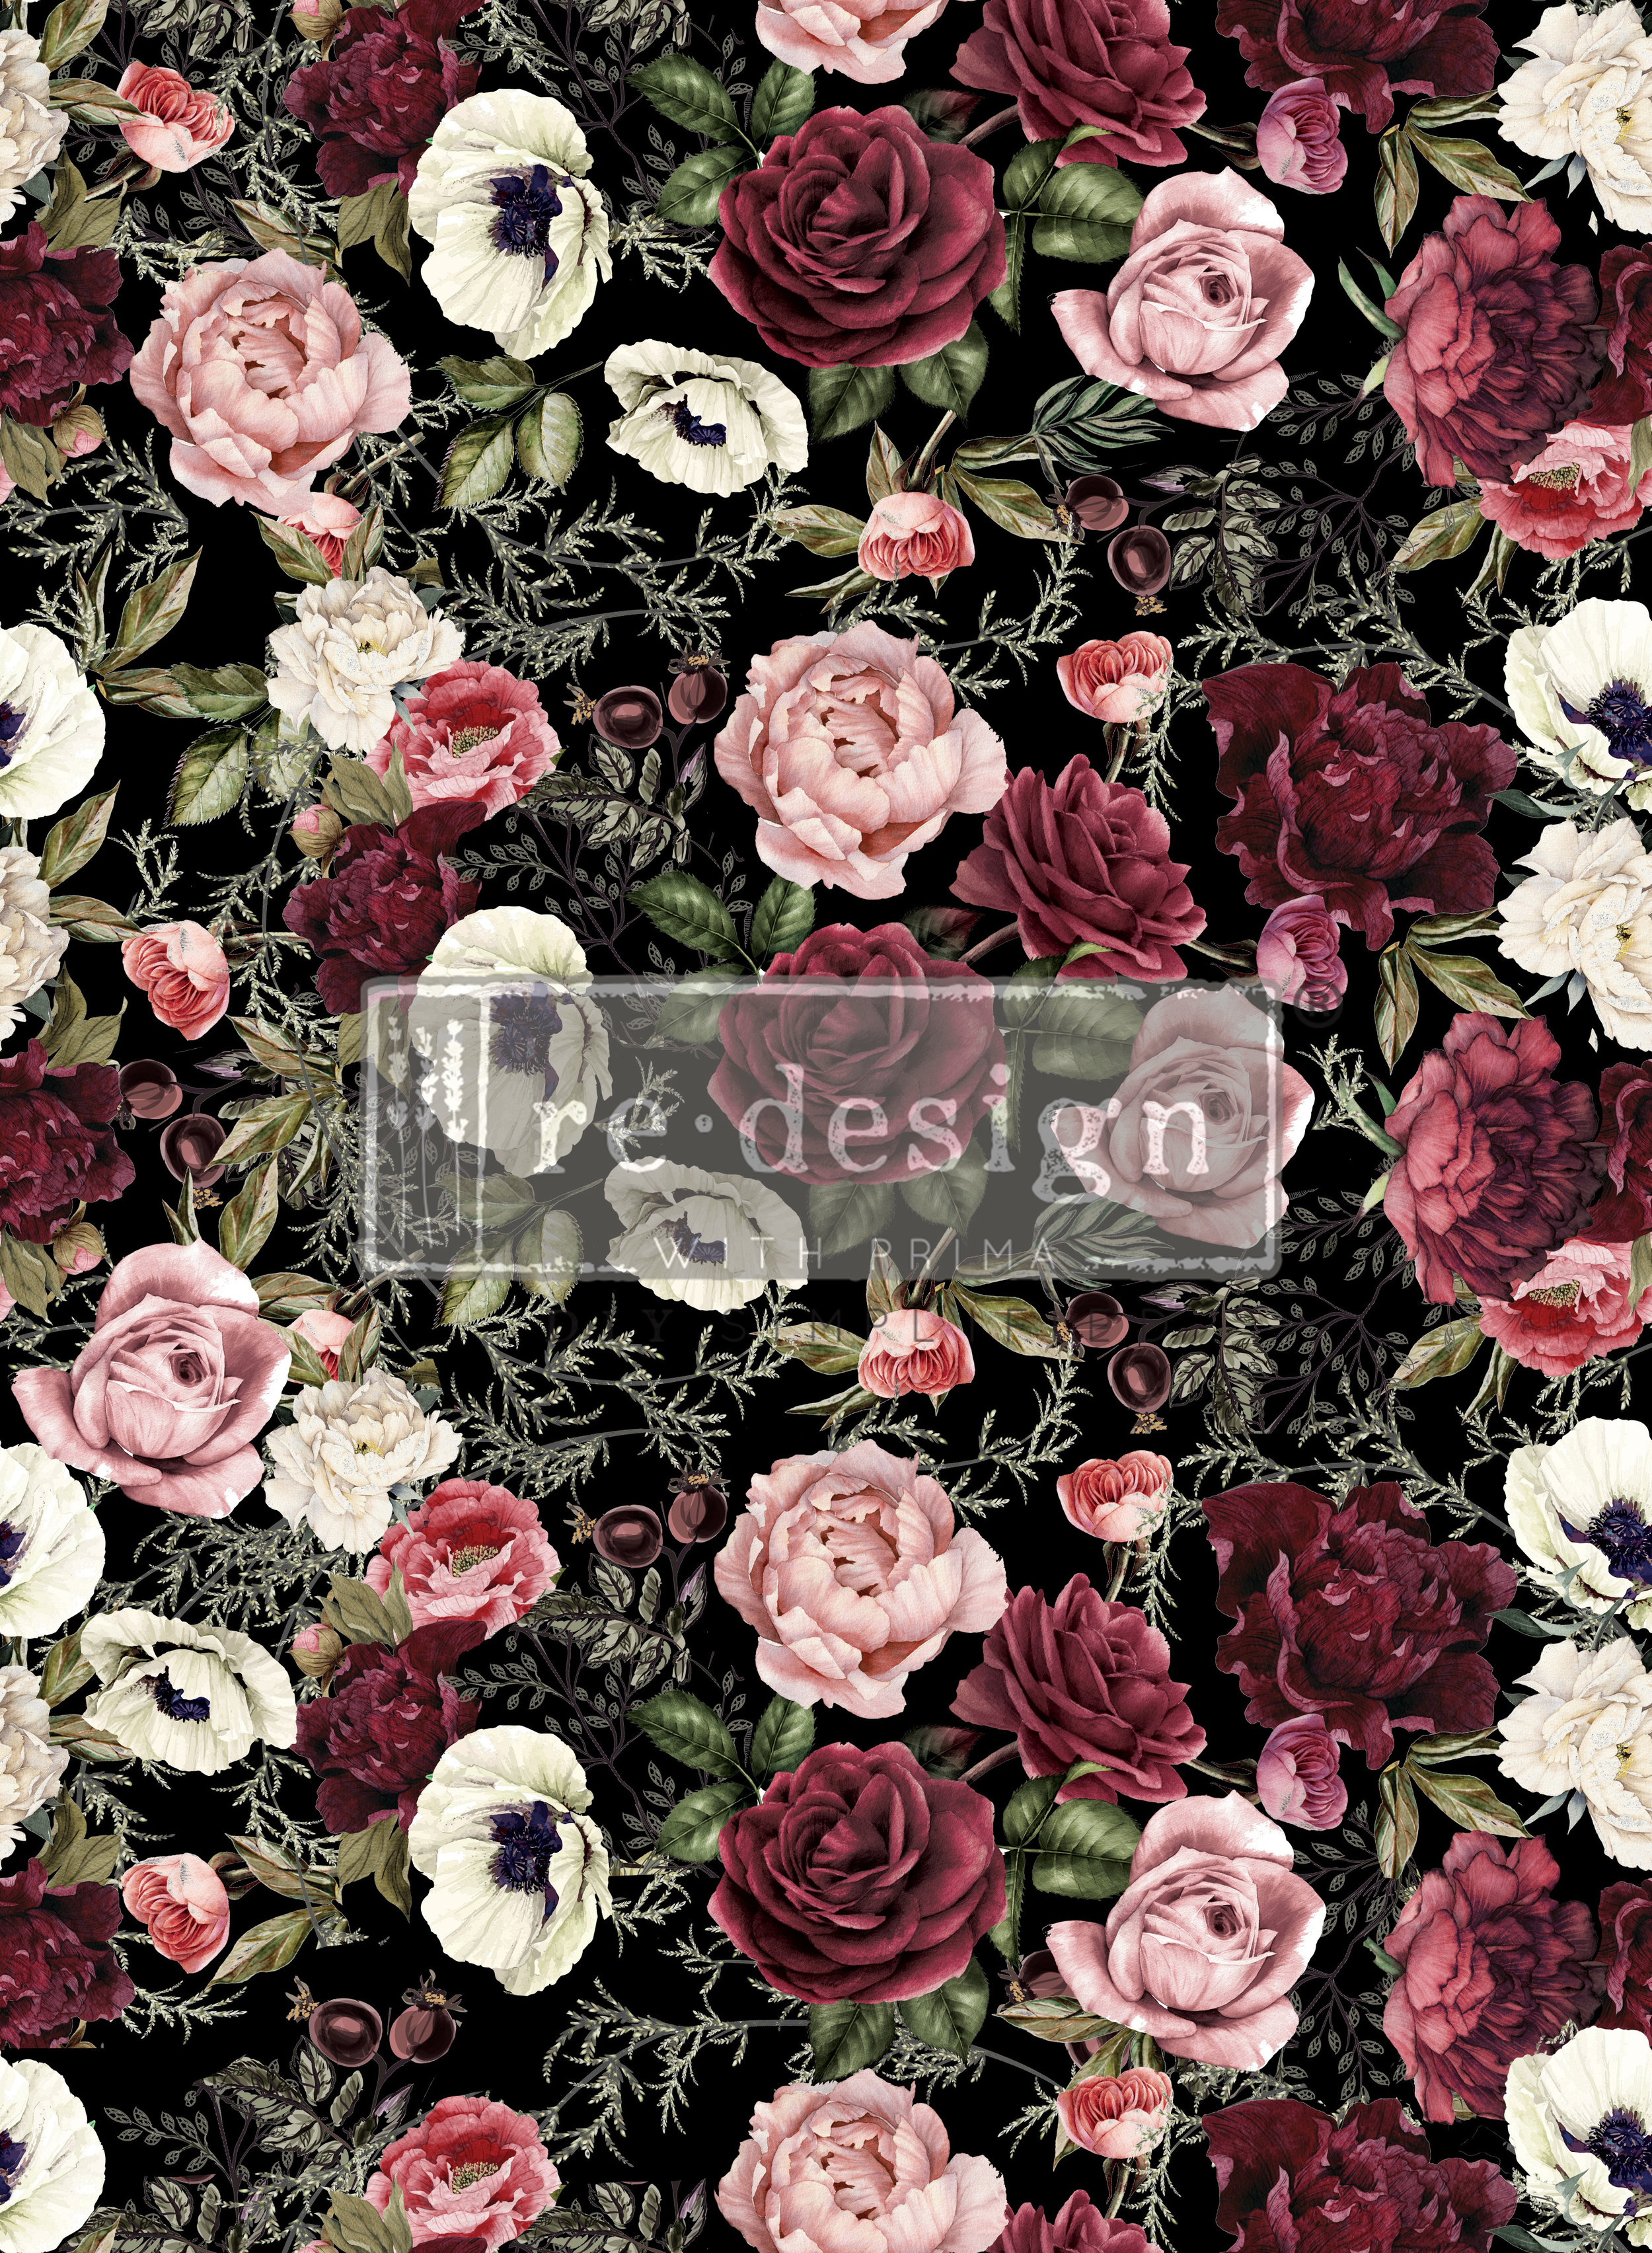 635428-Dark Romance